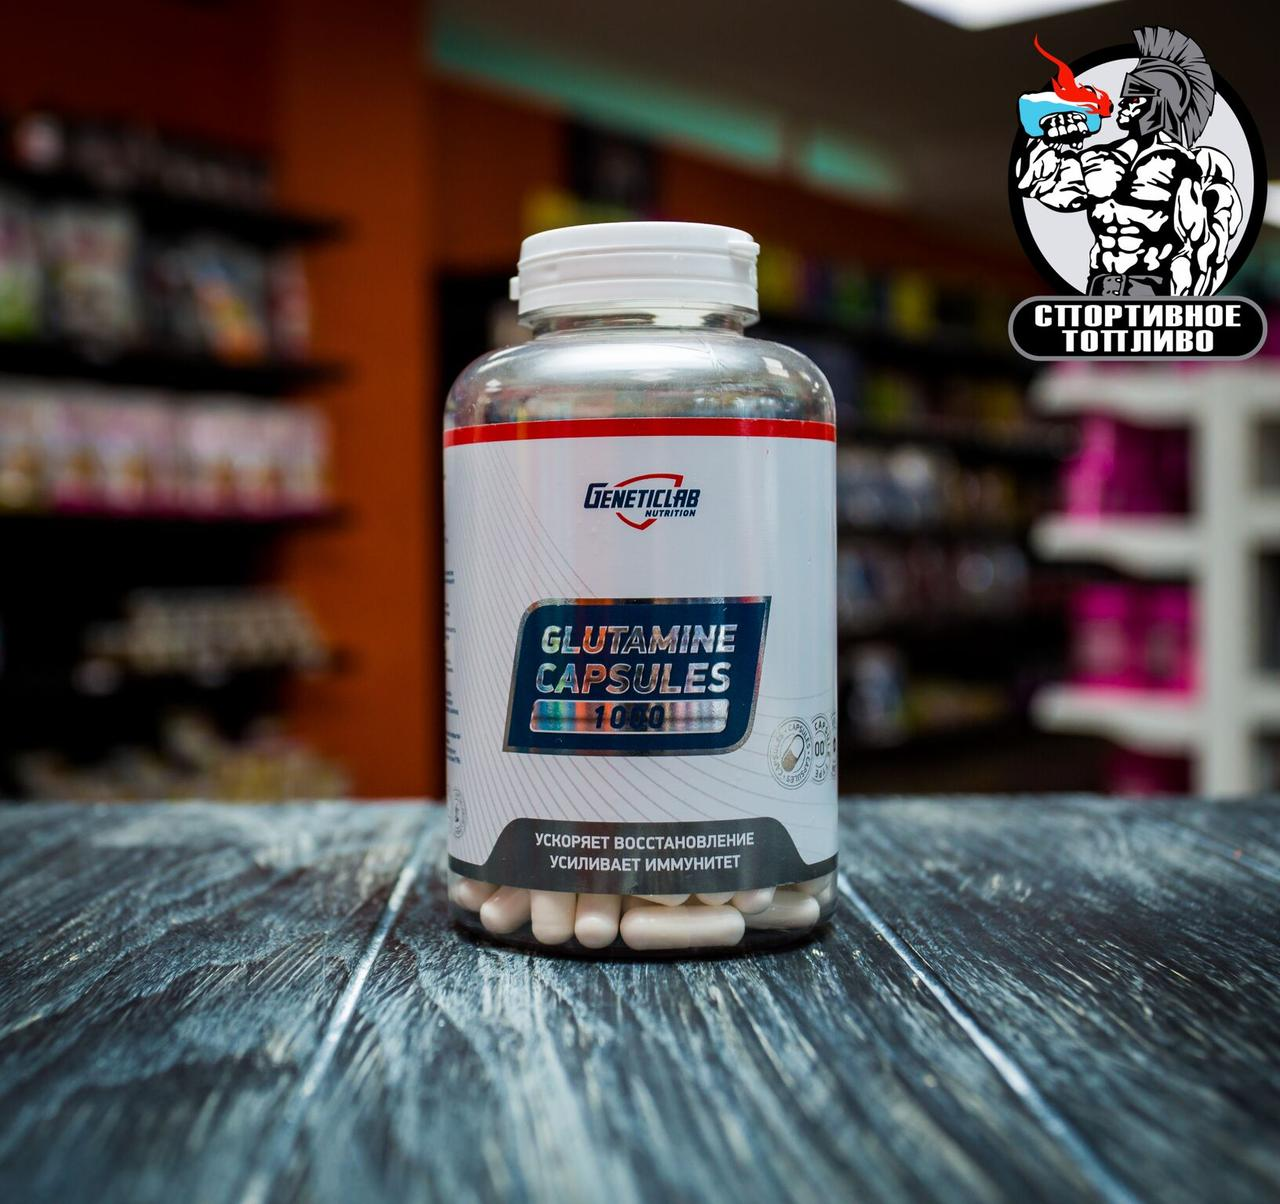 Geneticlab GLUTAMINE capsules 180гр/90порций